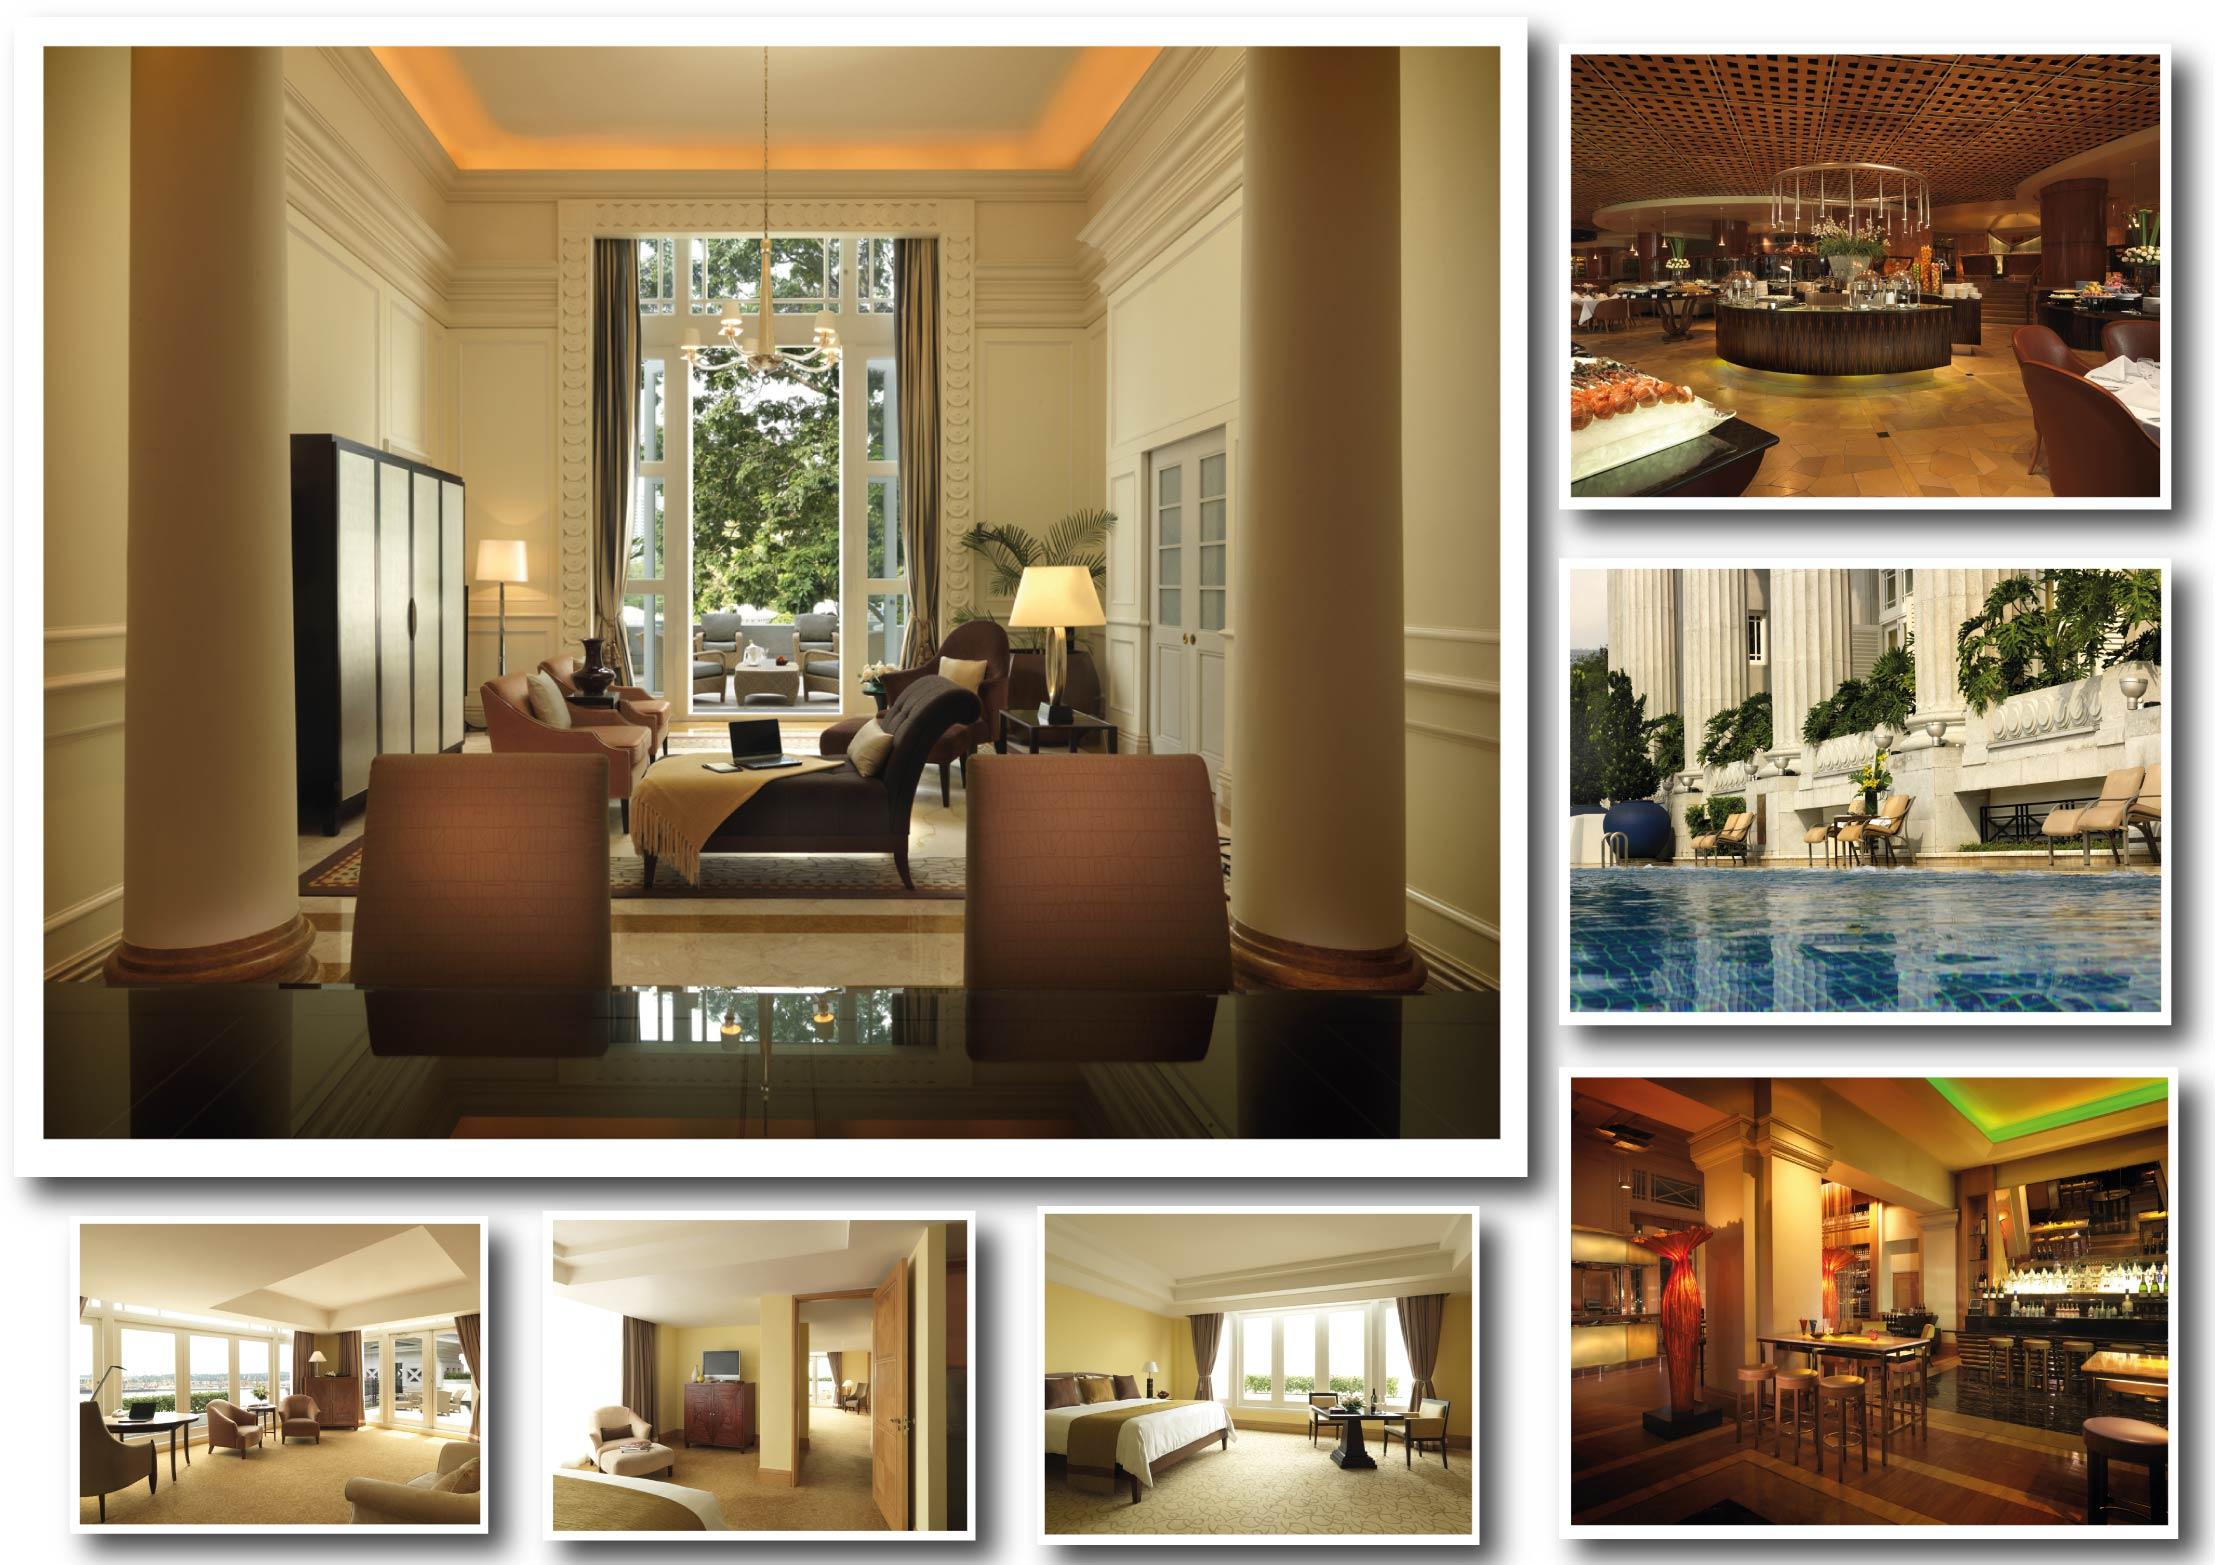 Fullerton Bay Hotel Singapore Rooms Interior Photographs